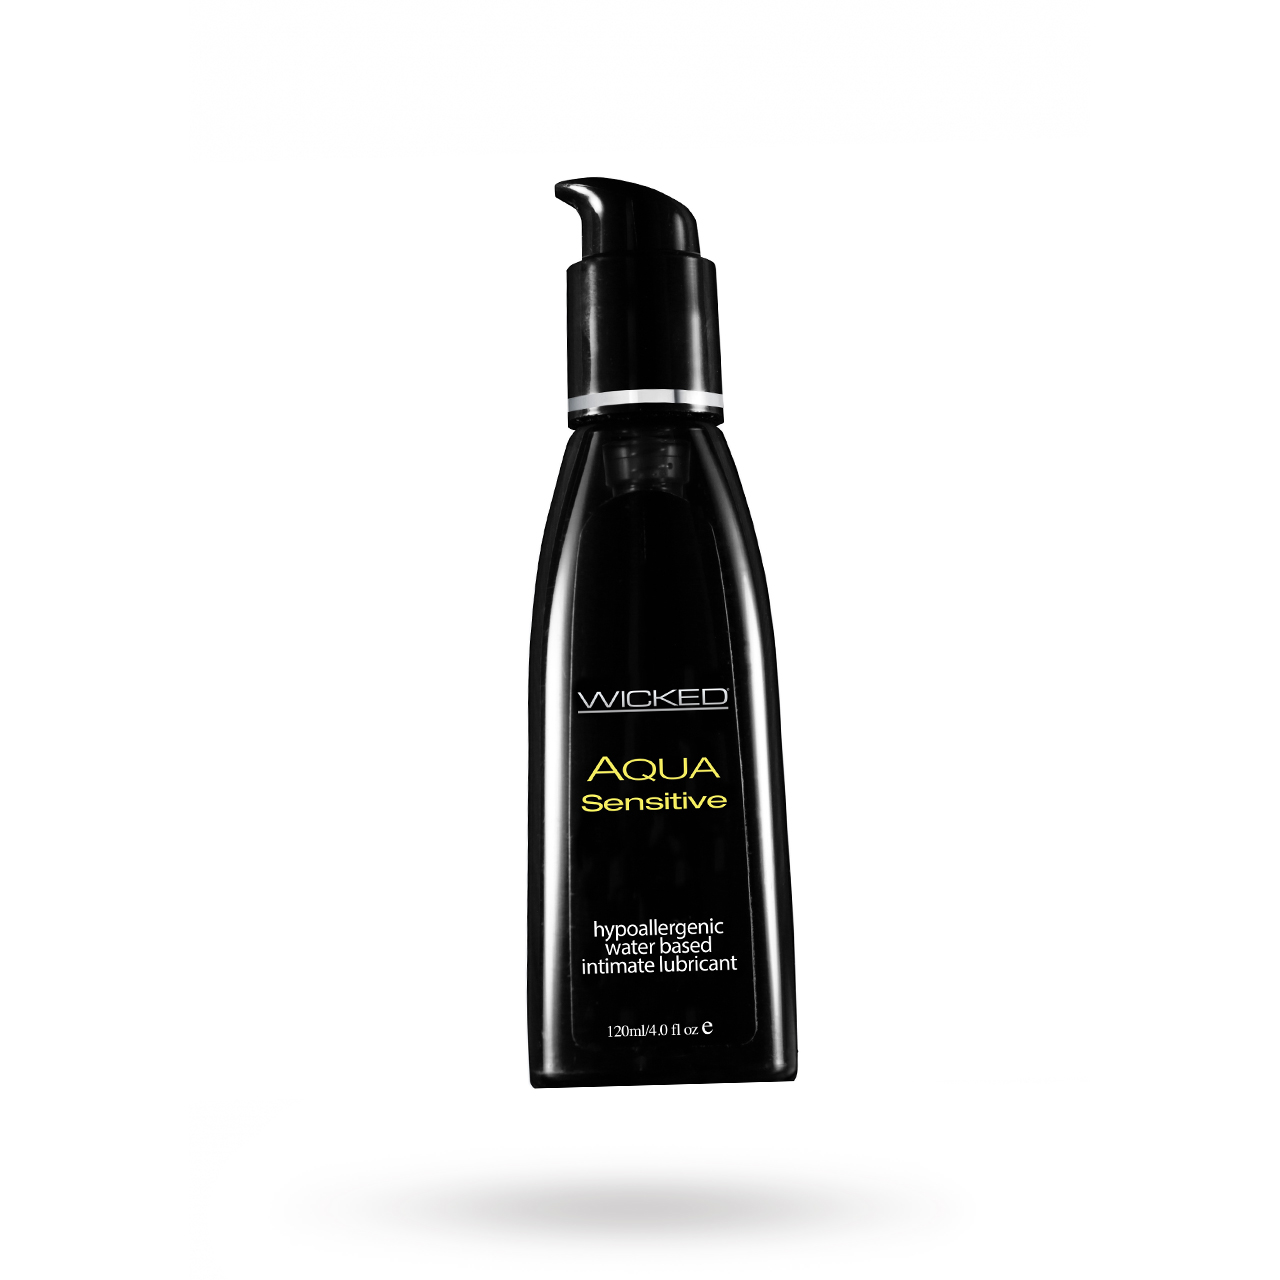 AQUA Sensitive Lubricant | Brands, Wicked Sensual Care, GLIDMEDEL ETC., GLIDMEDEL, Vattenbaserade glidmedel | Intimast.se - Sexleksaker